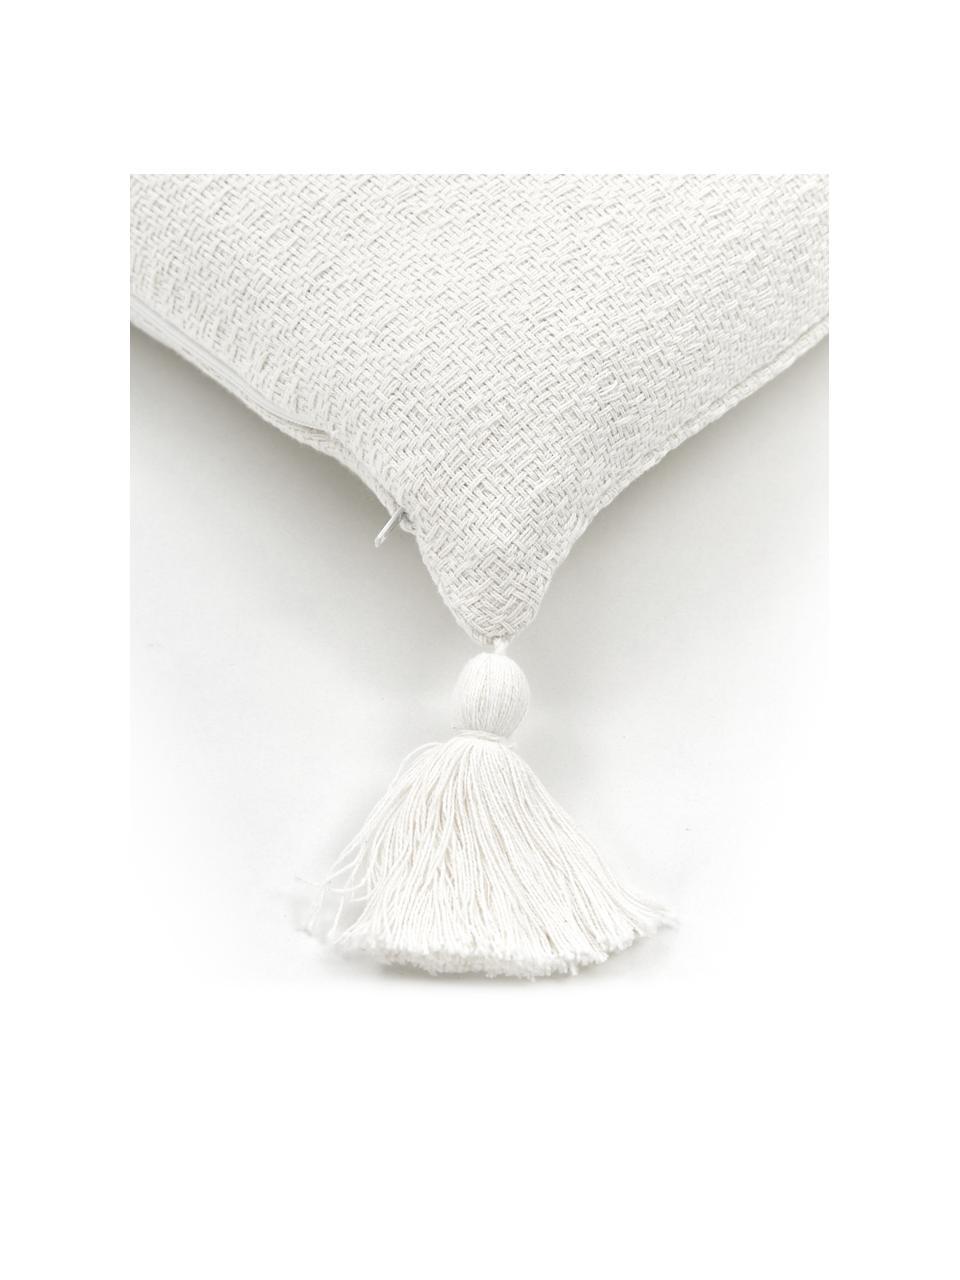 Kissenhülle Lori in Cremeweiß, 100% Baumwolle, Weiß, 30 x 50 cm